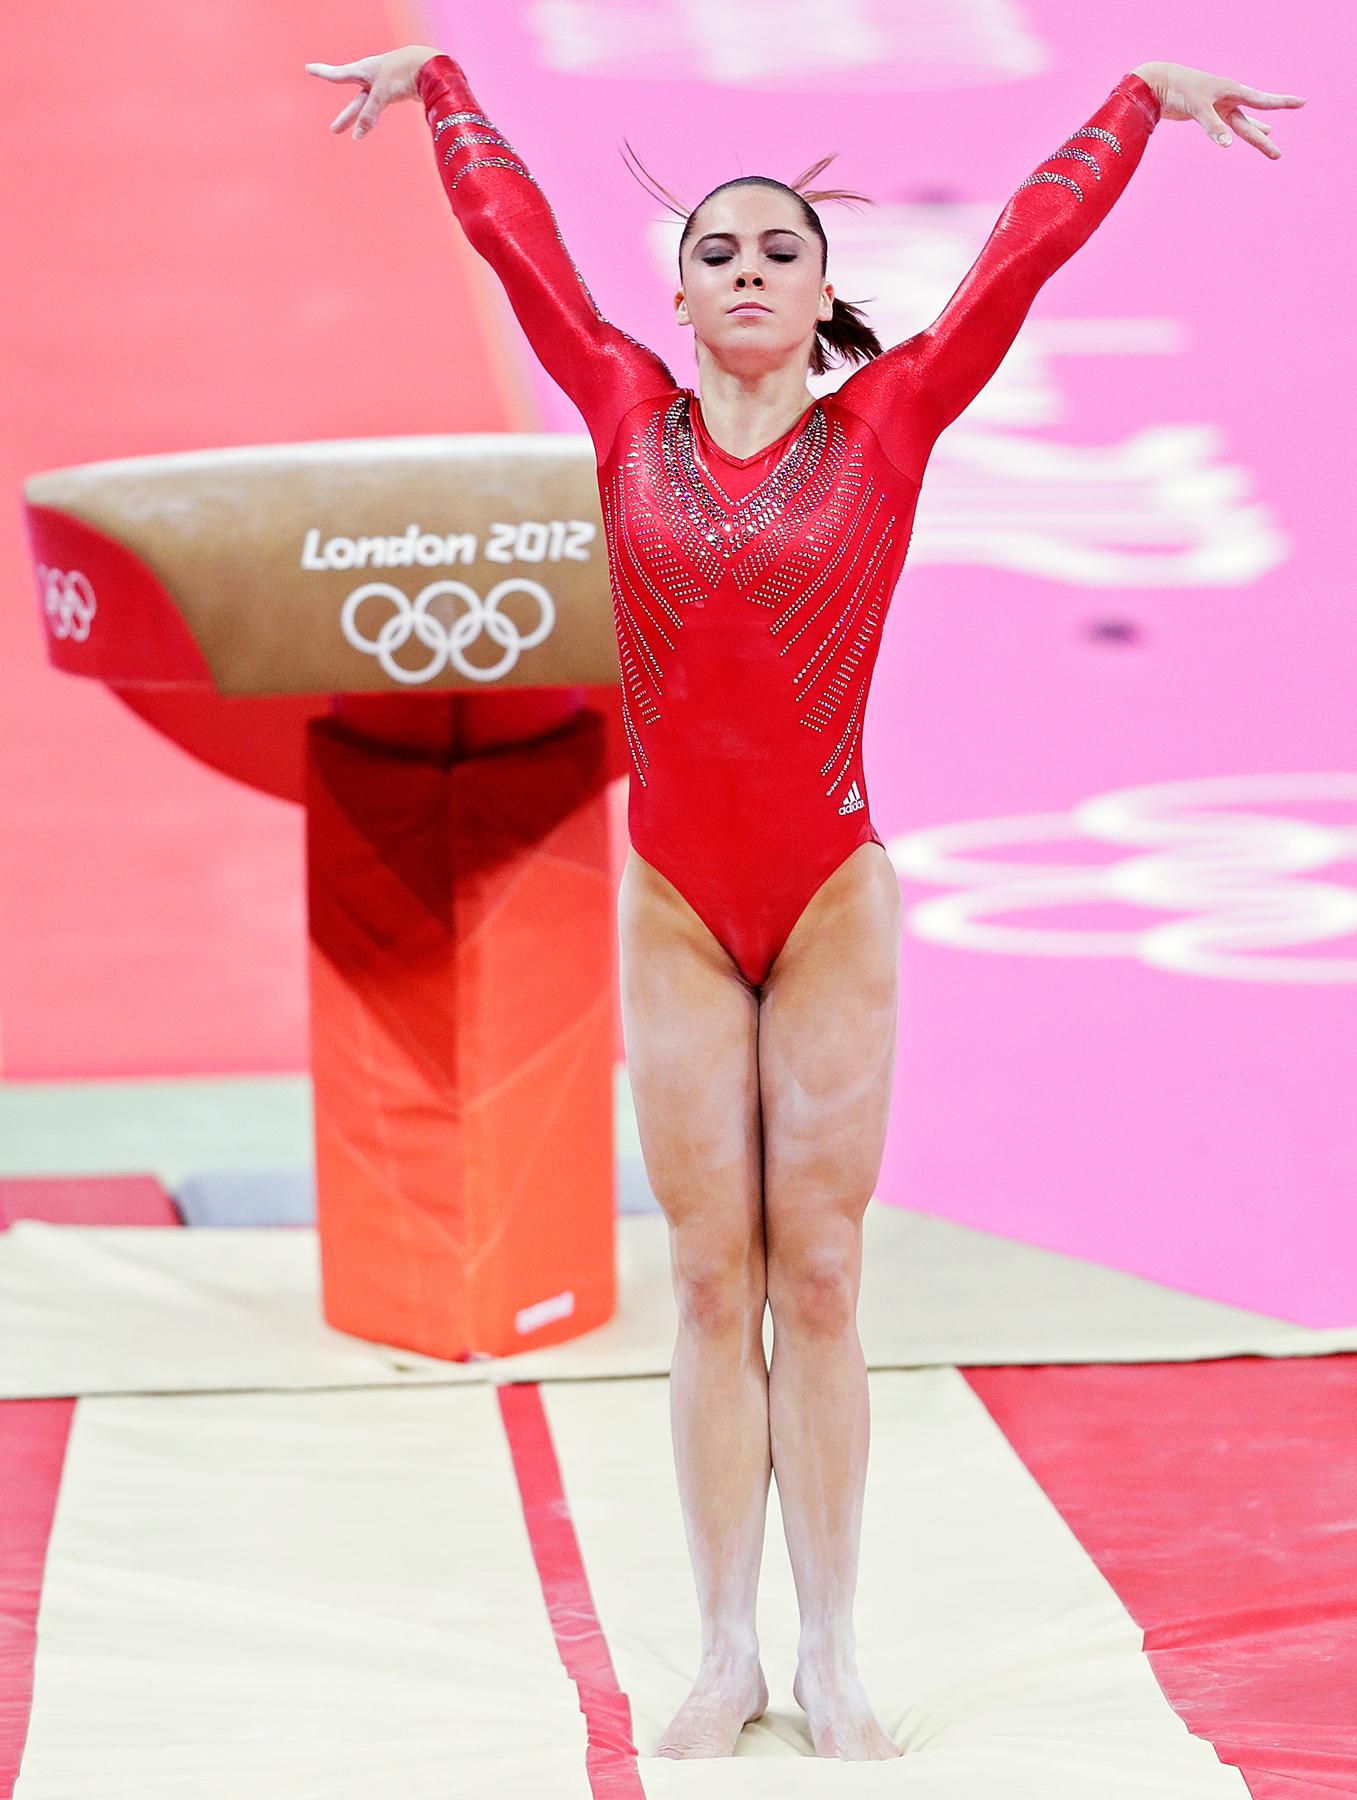 mckayla maroney quitting gymnastics was an identity crisis